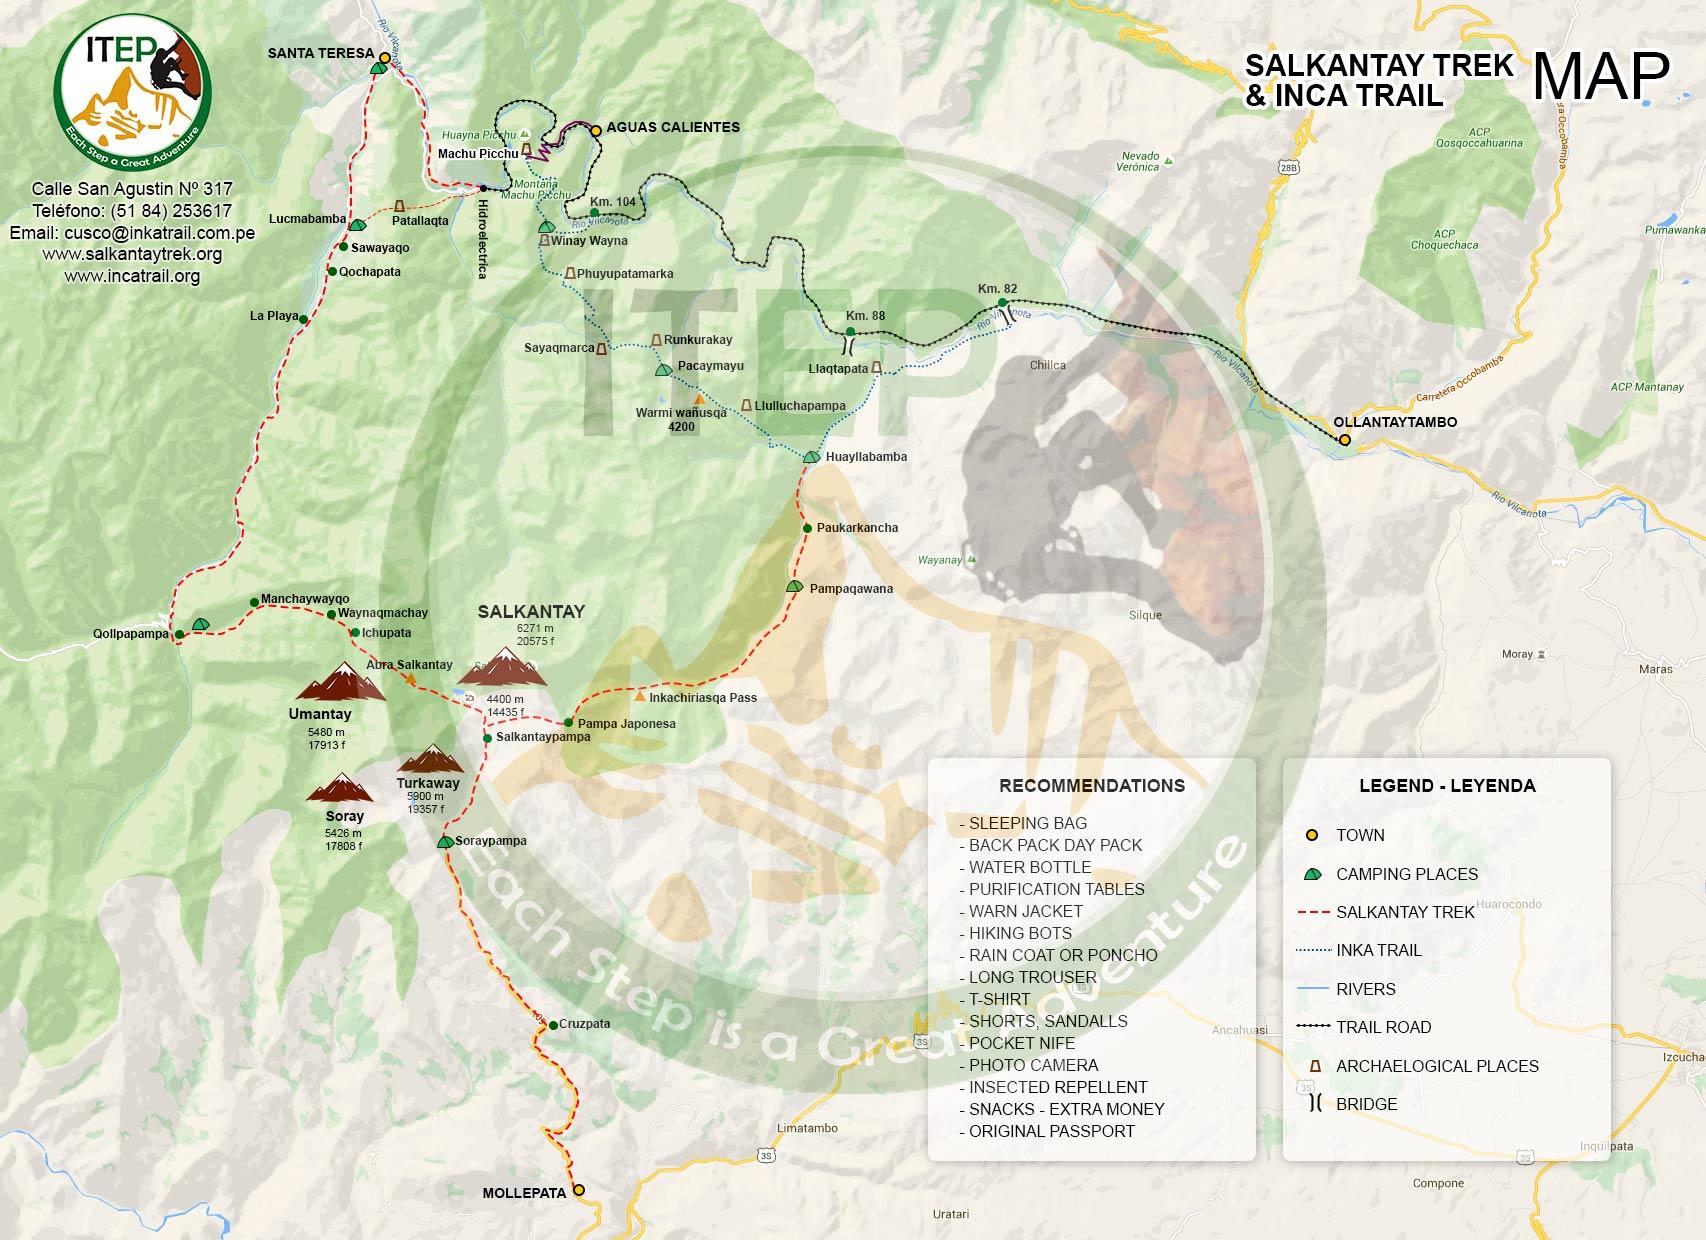 Salkantay Trek Map to Machu Picchu